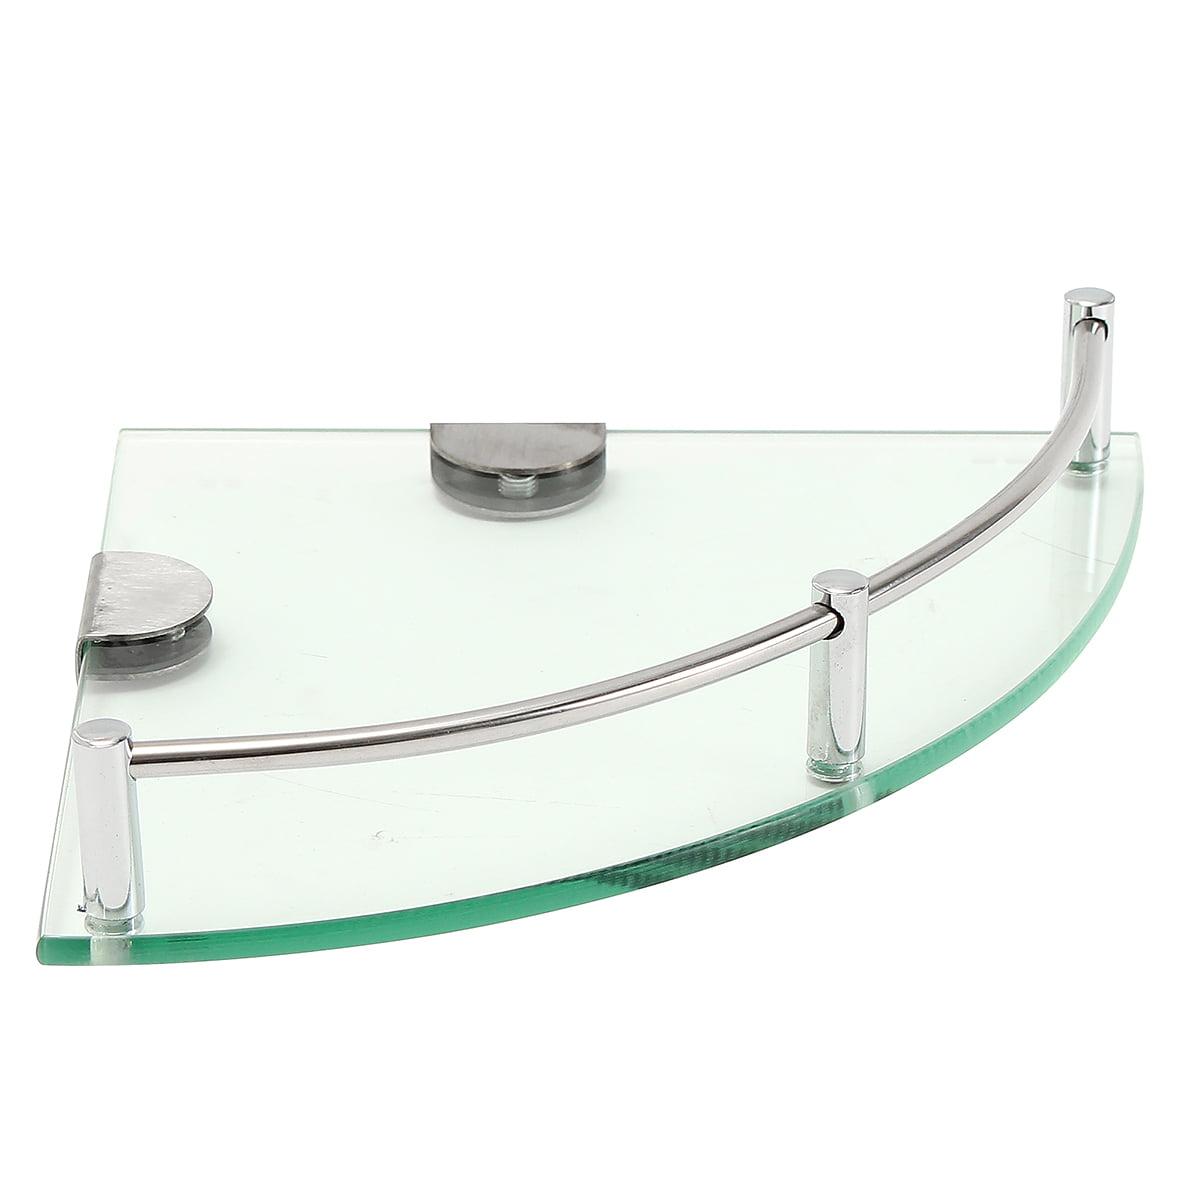 Modern Glass Corner Holder Triangular Shelf Wall Mounted Bathroom Shower